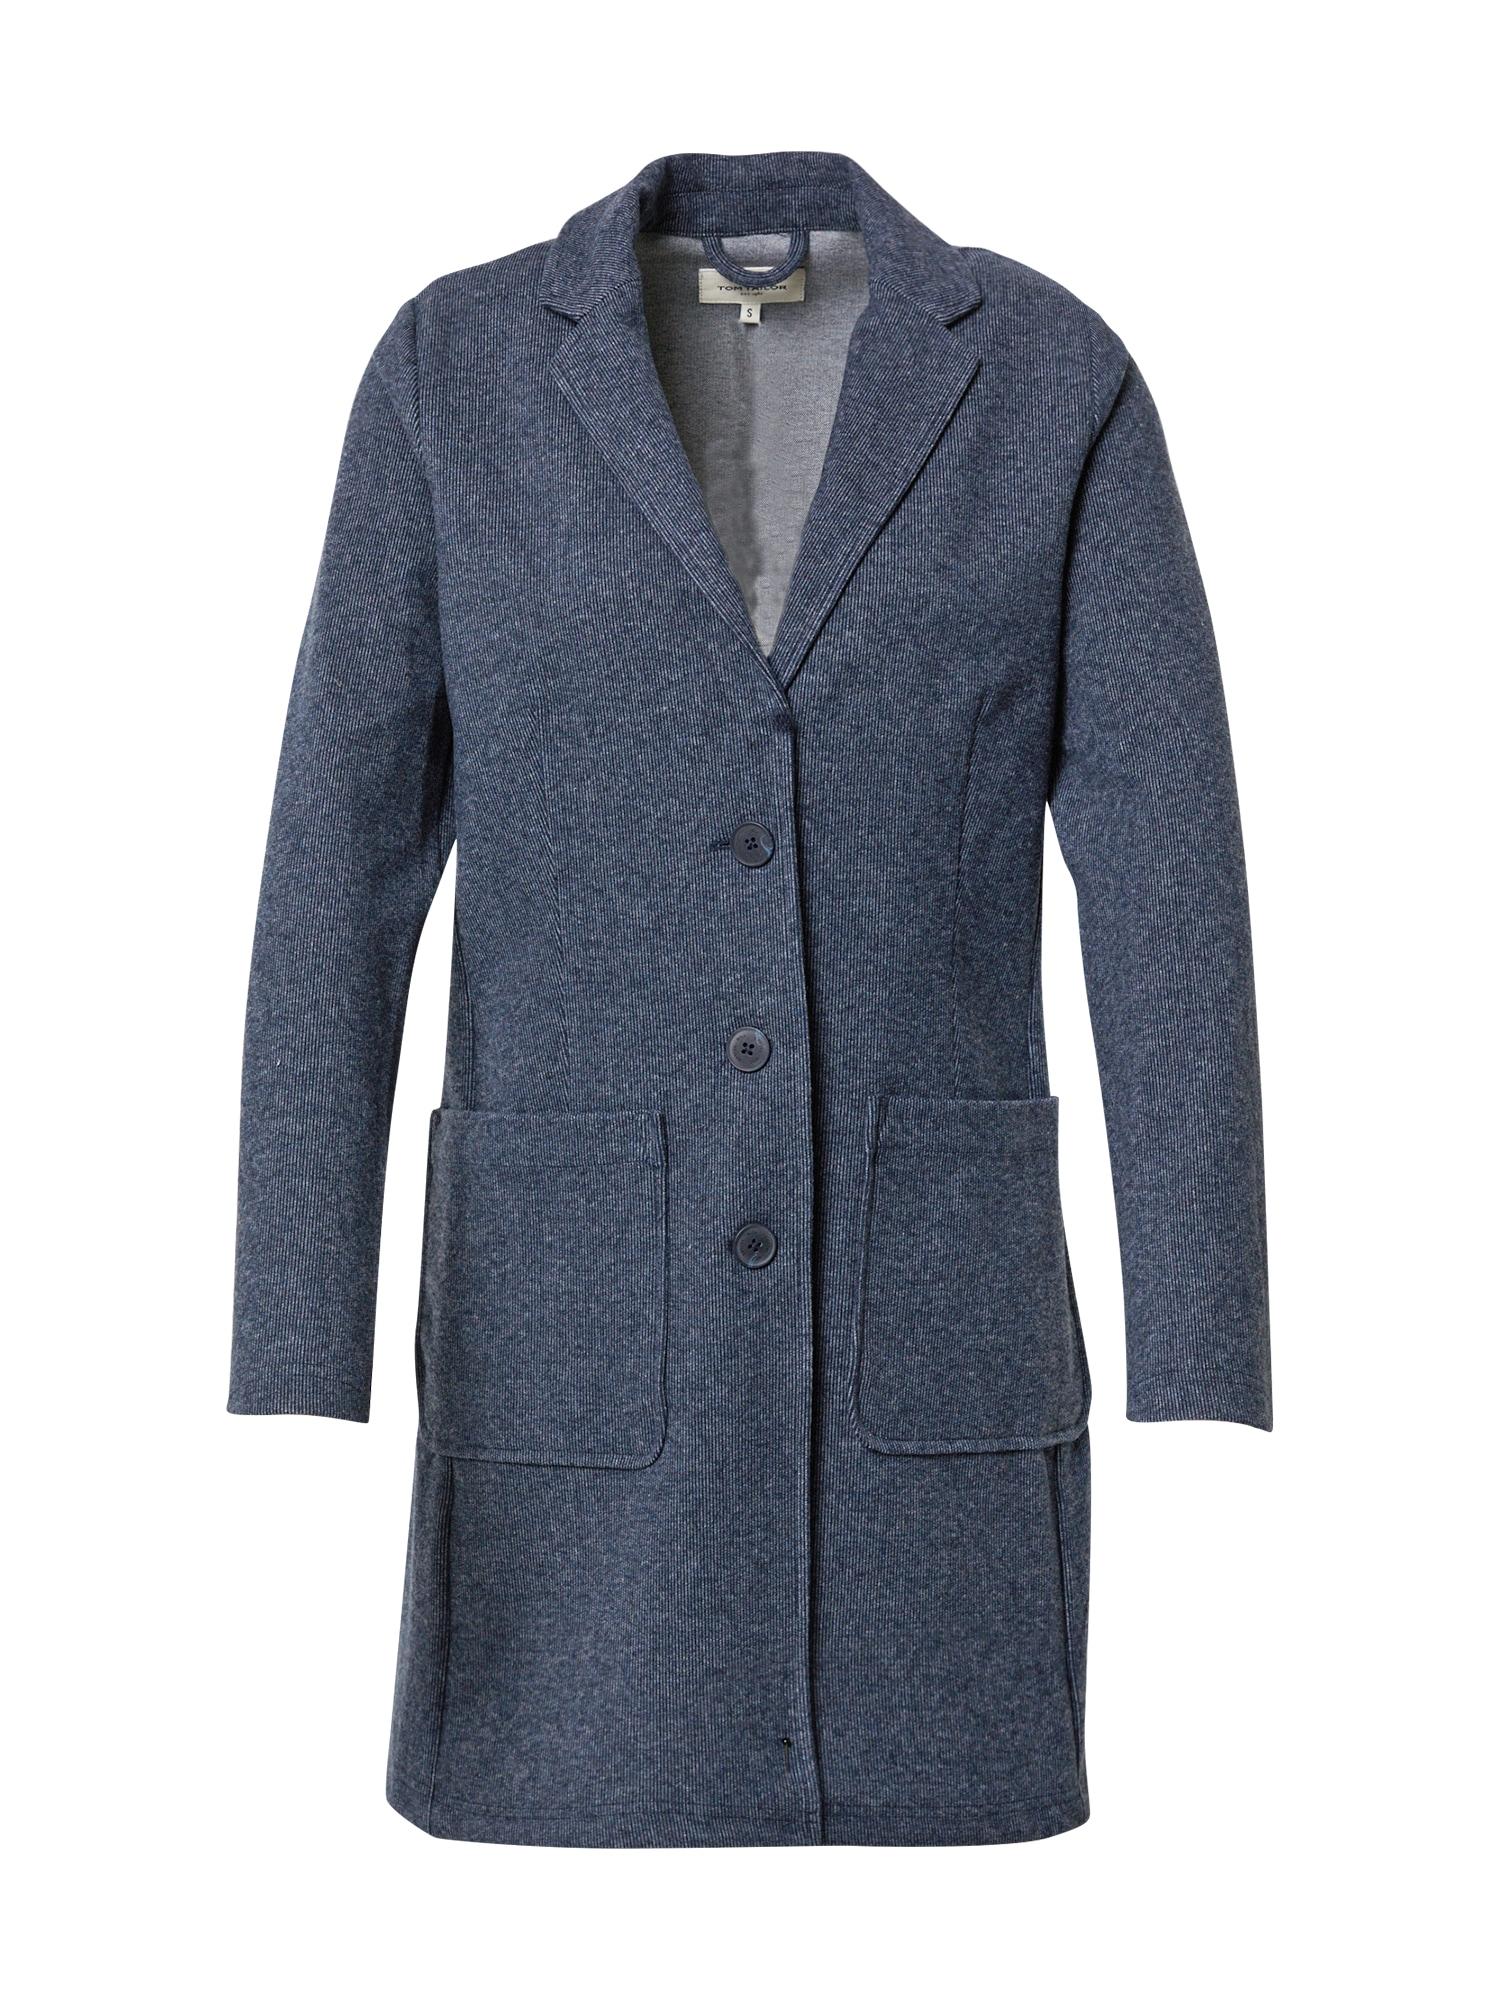 TOM TAILOR Demisezoninis paltas bazalto pilka